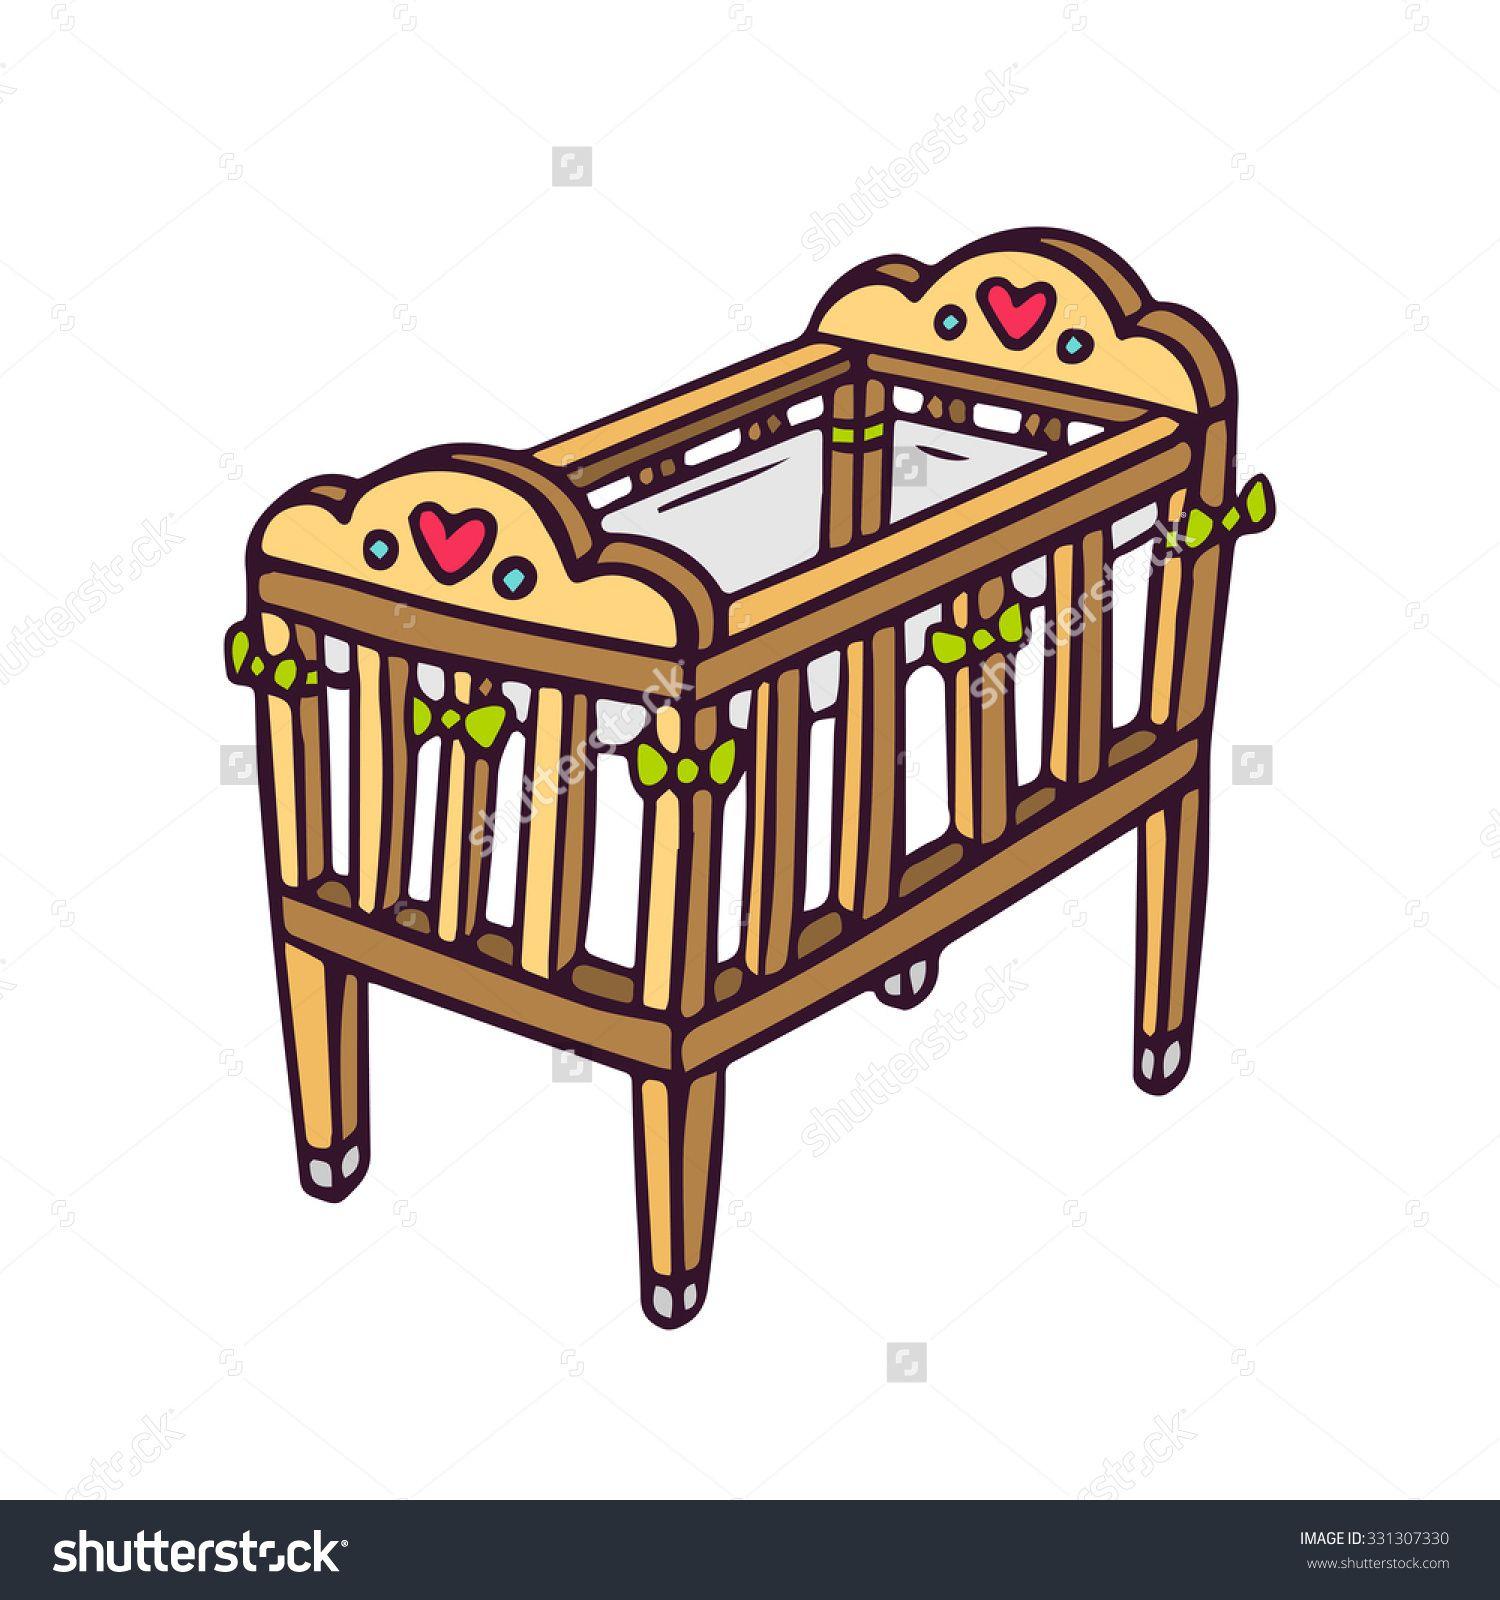 medium resolution of clipart cot clip arts galleries art gallery clip art baby cribs cot